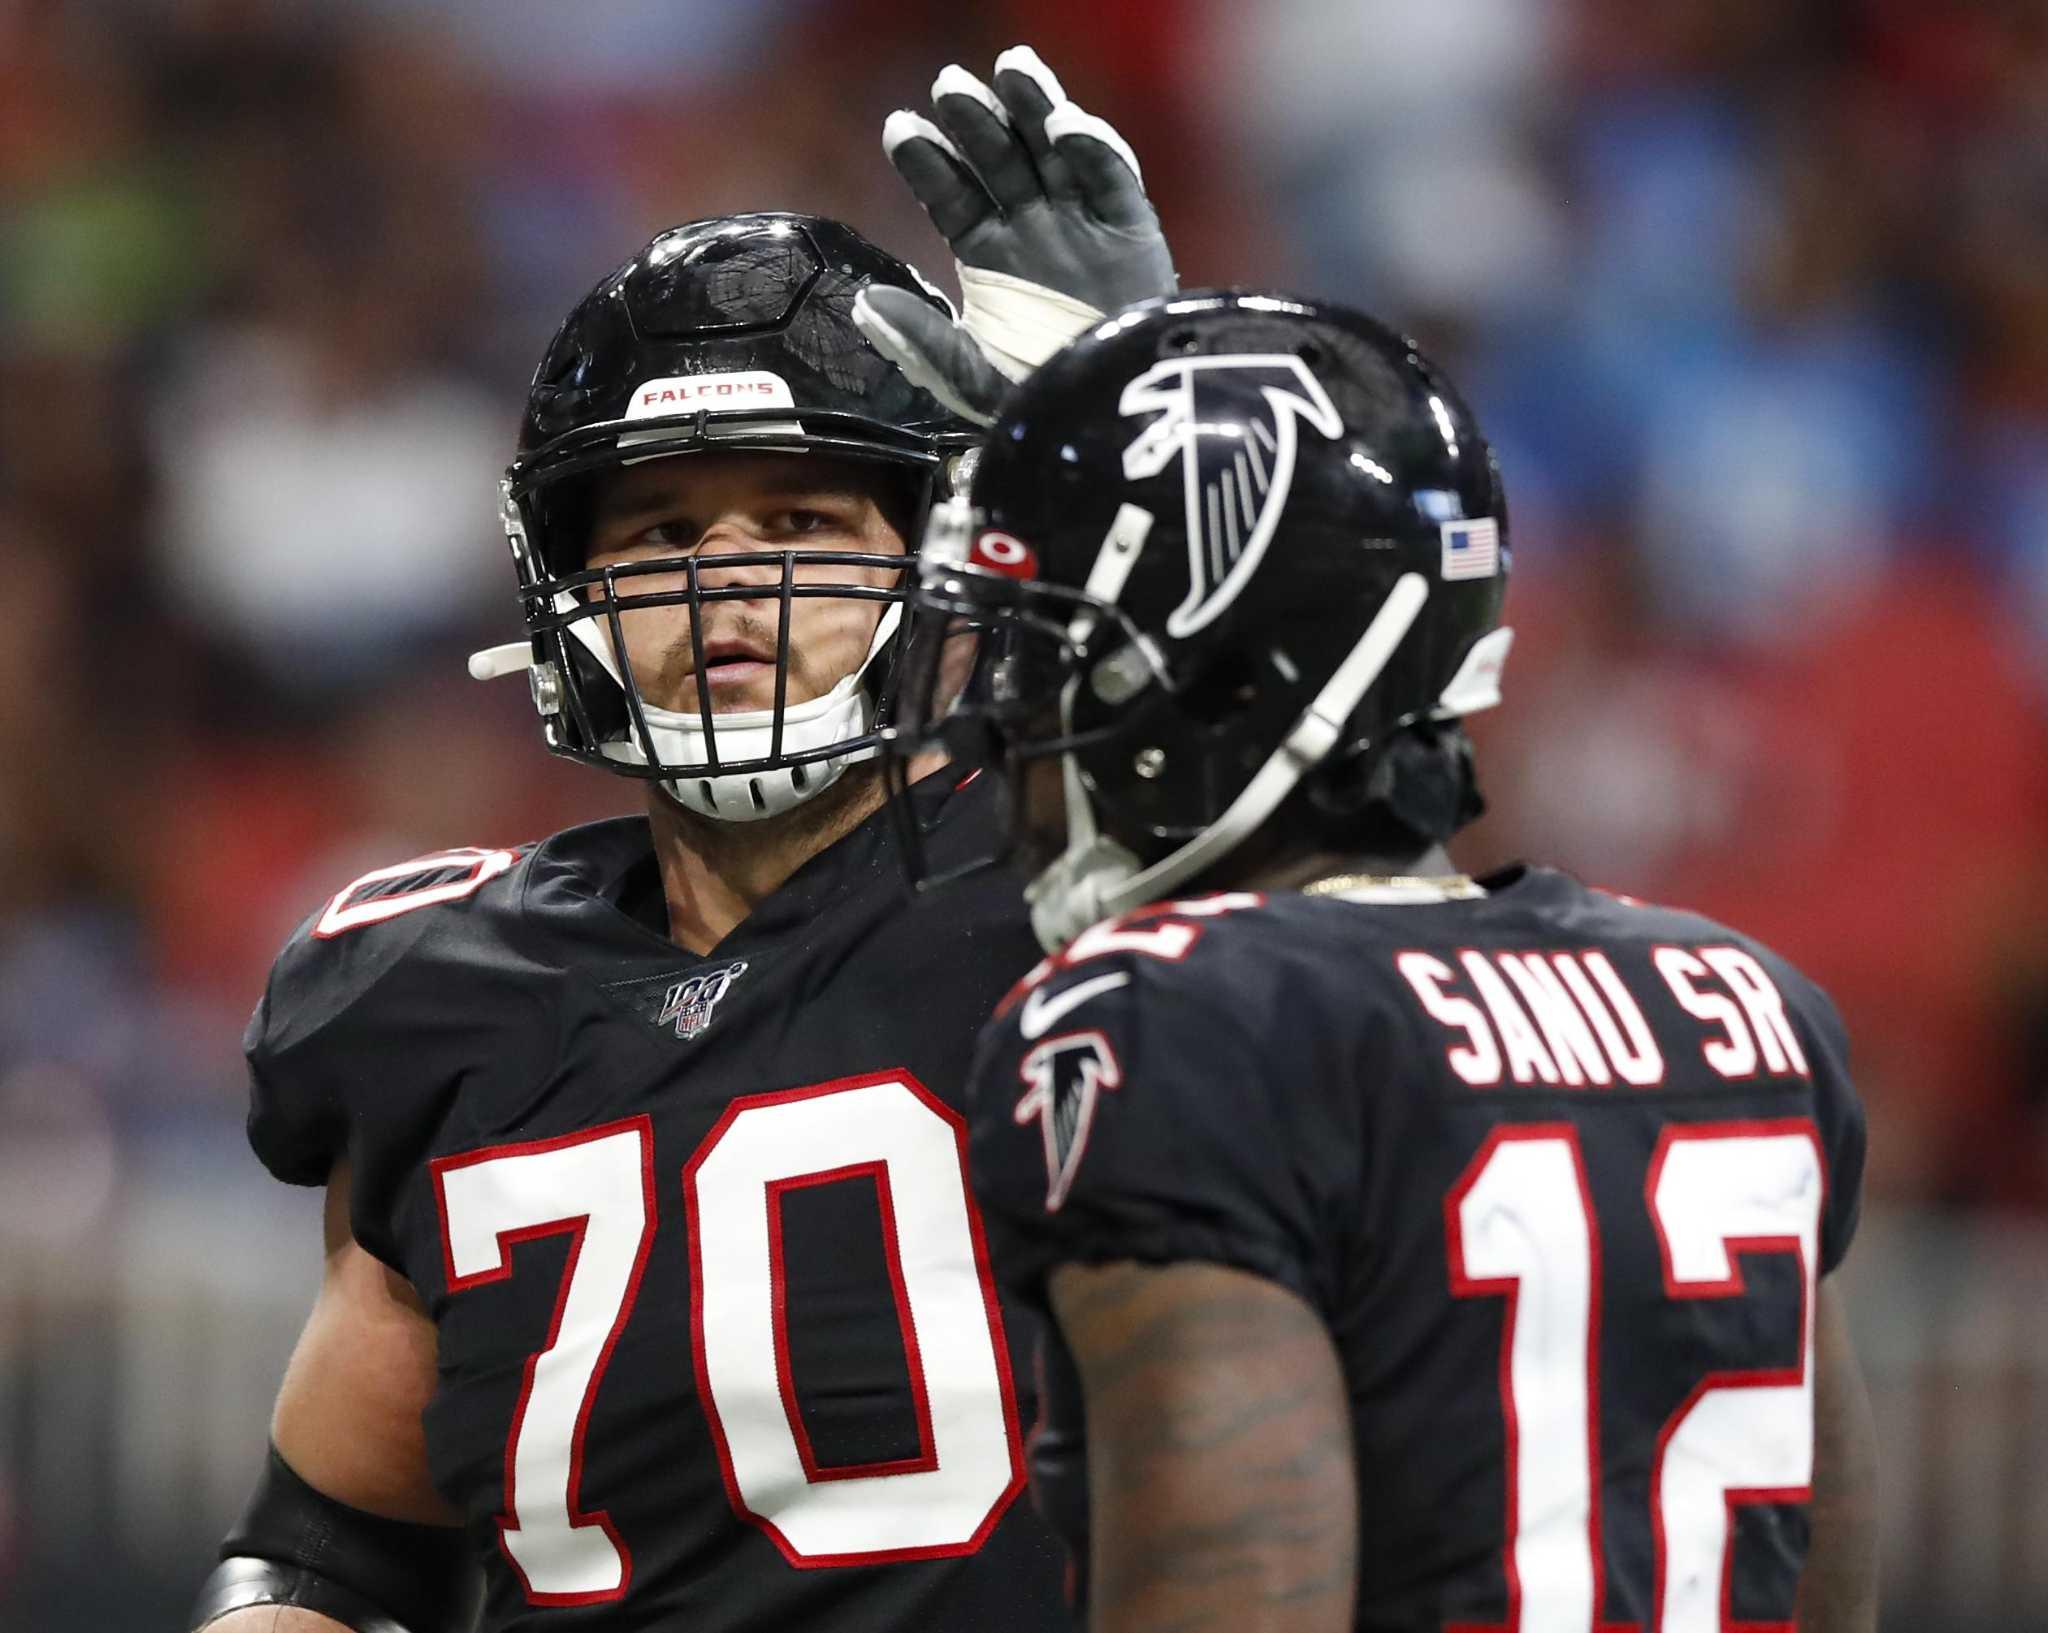 Atlanta Falcons left tackle Jake Matthews makes name for himself